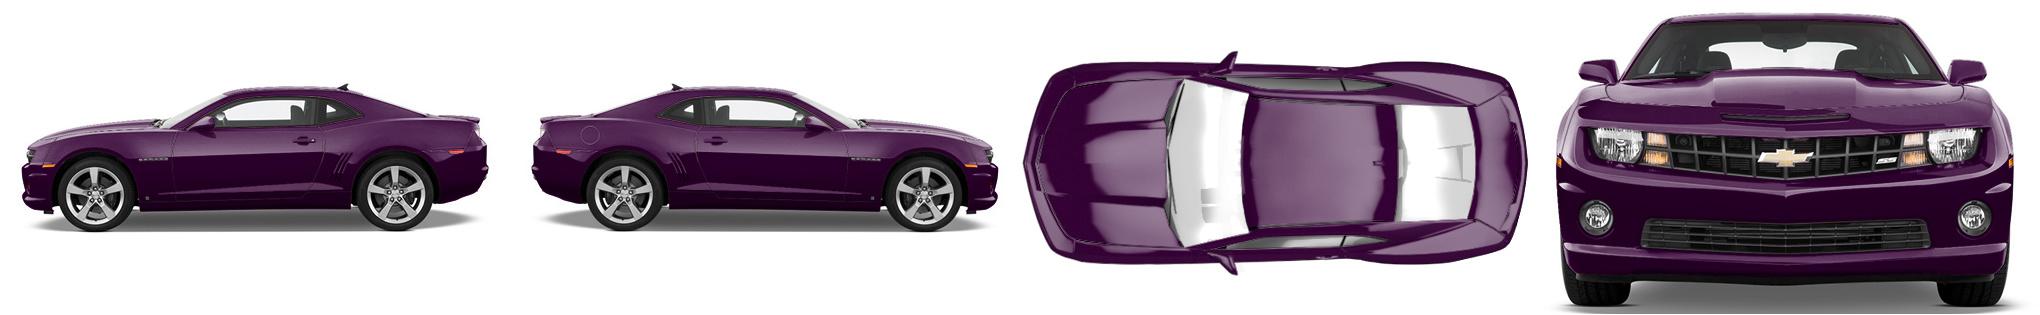 Muscle Car Wrap #980